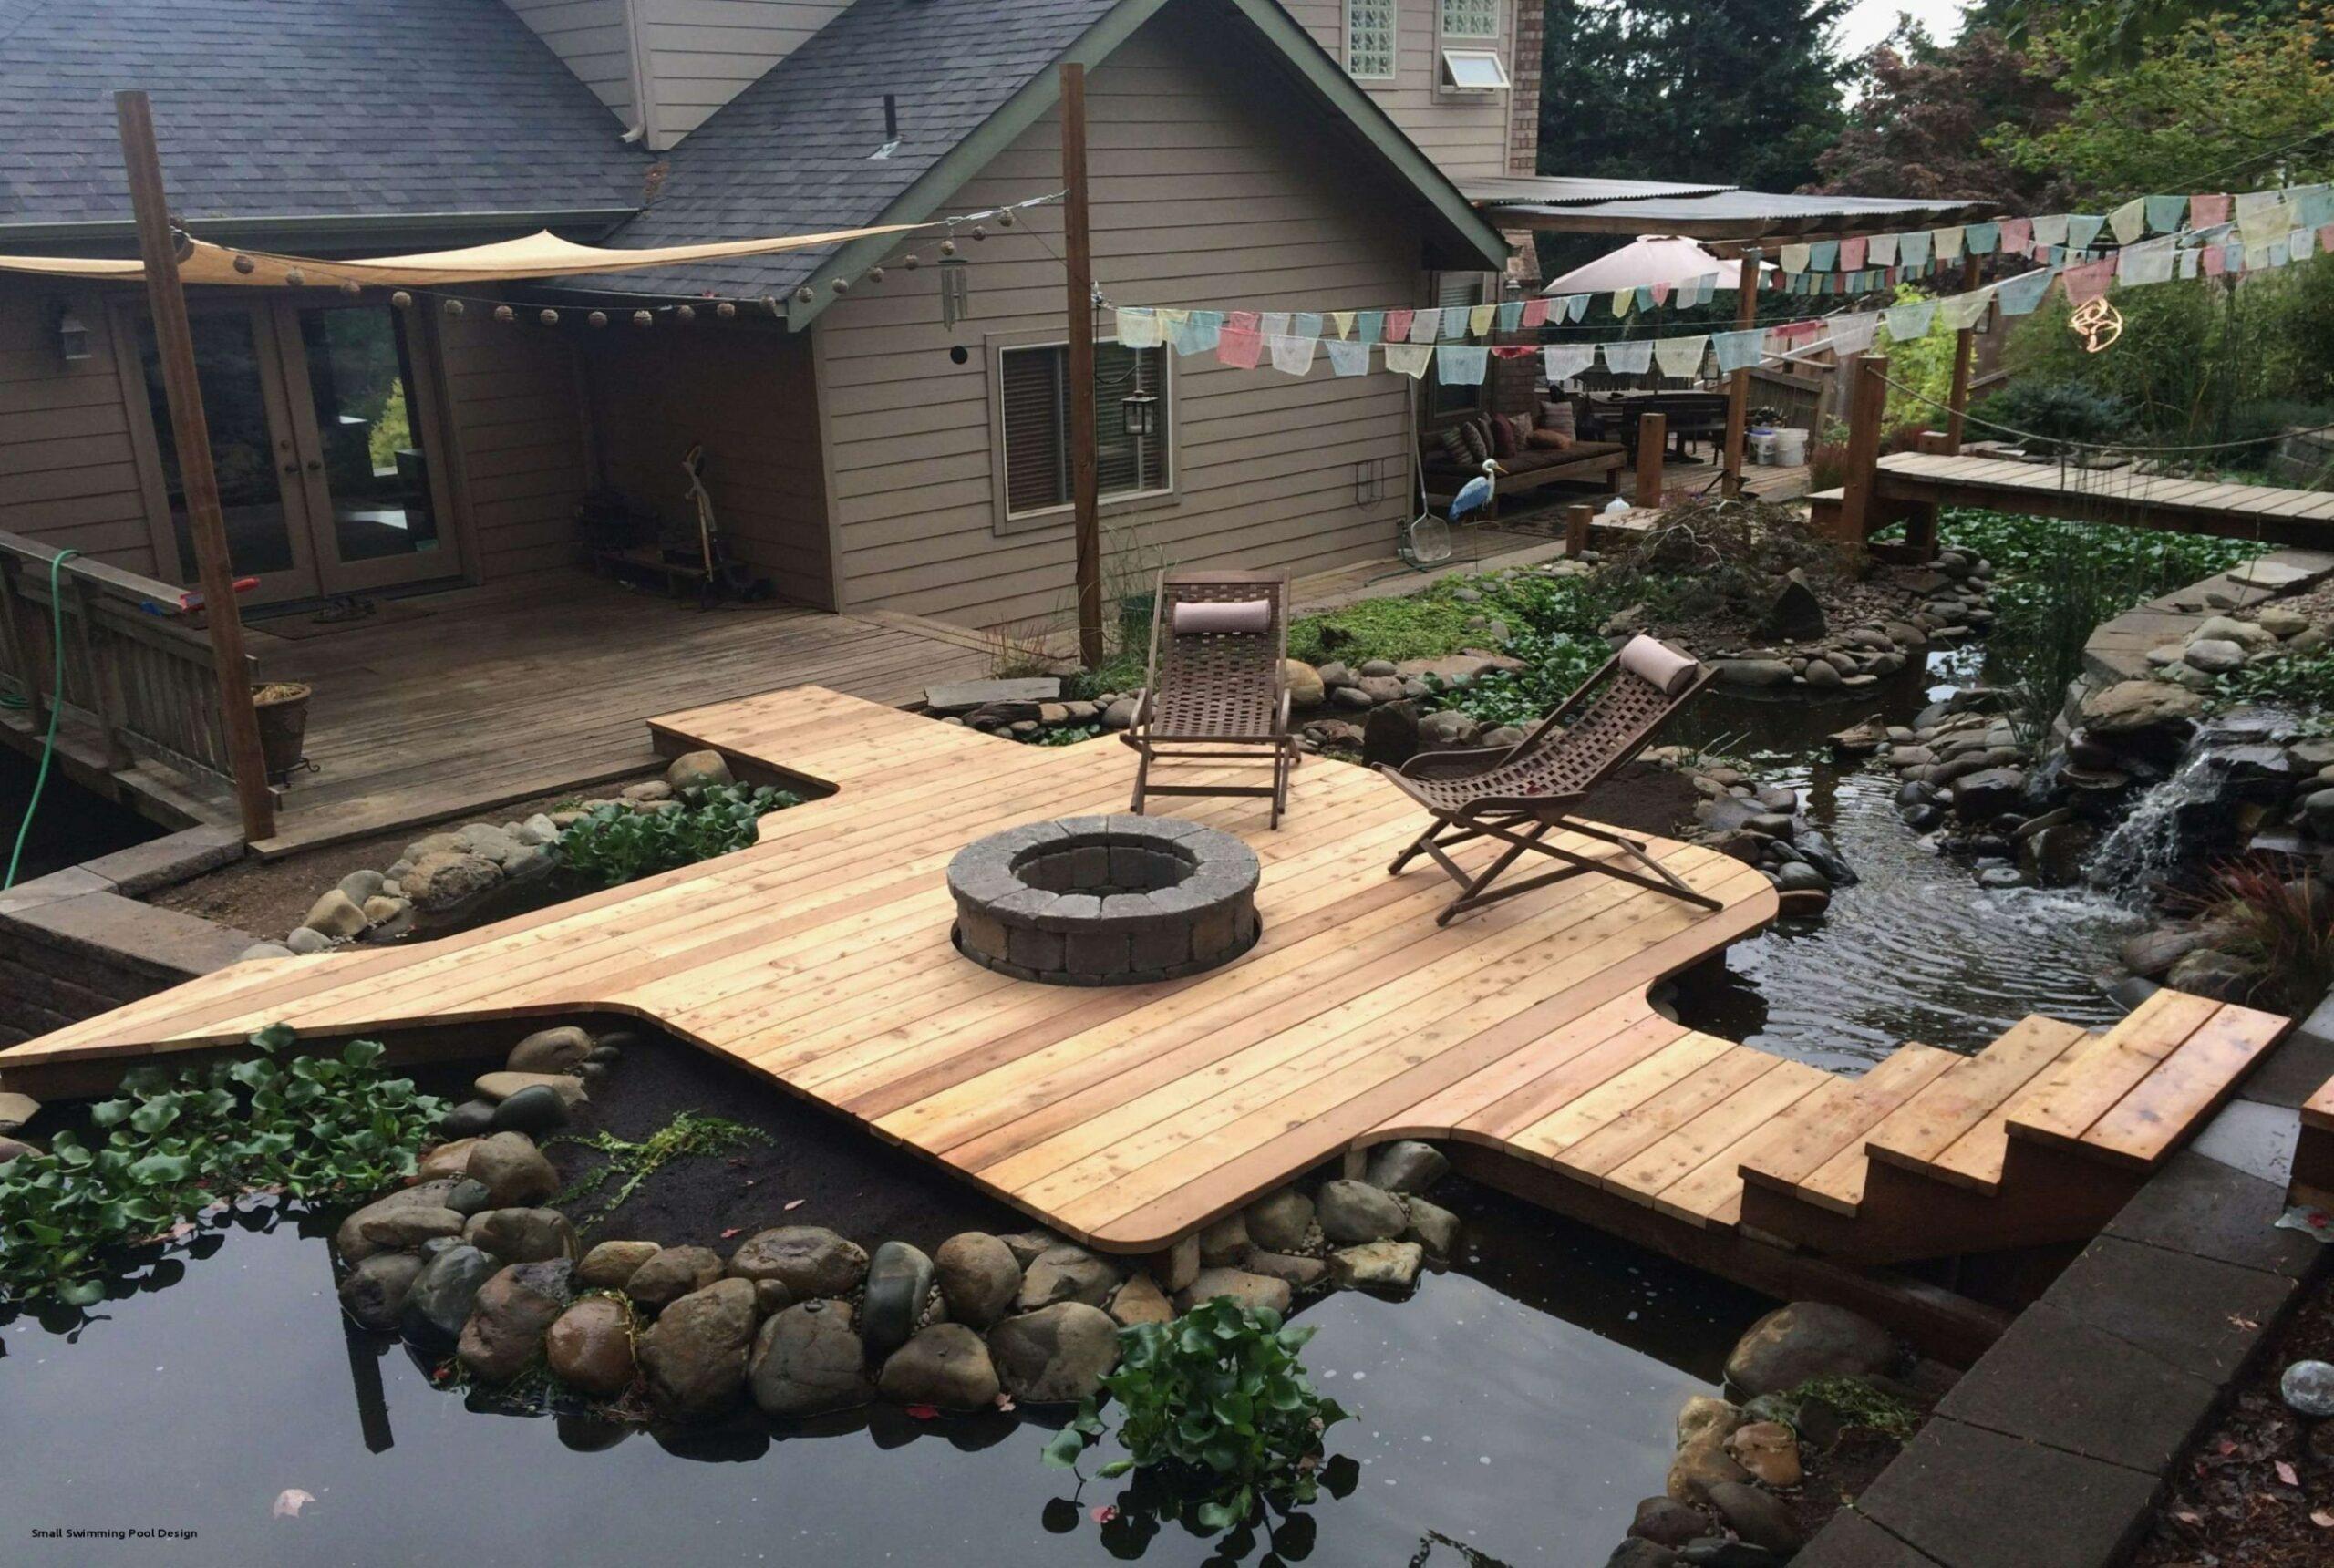 small backyard designs small backyard patio ideas beautiful diy backyard ideas of small backyard designs scaled